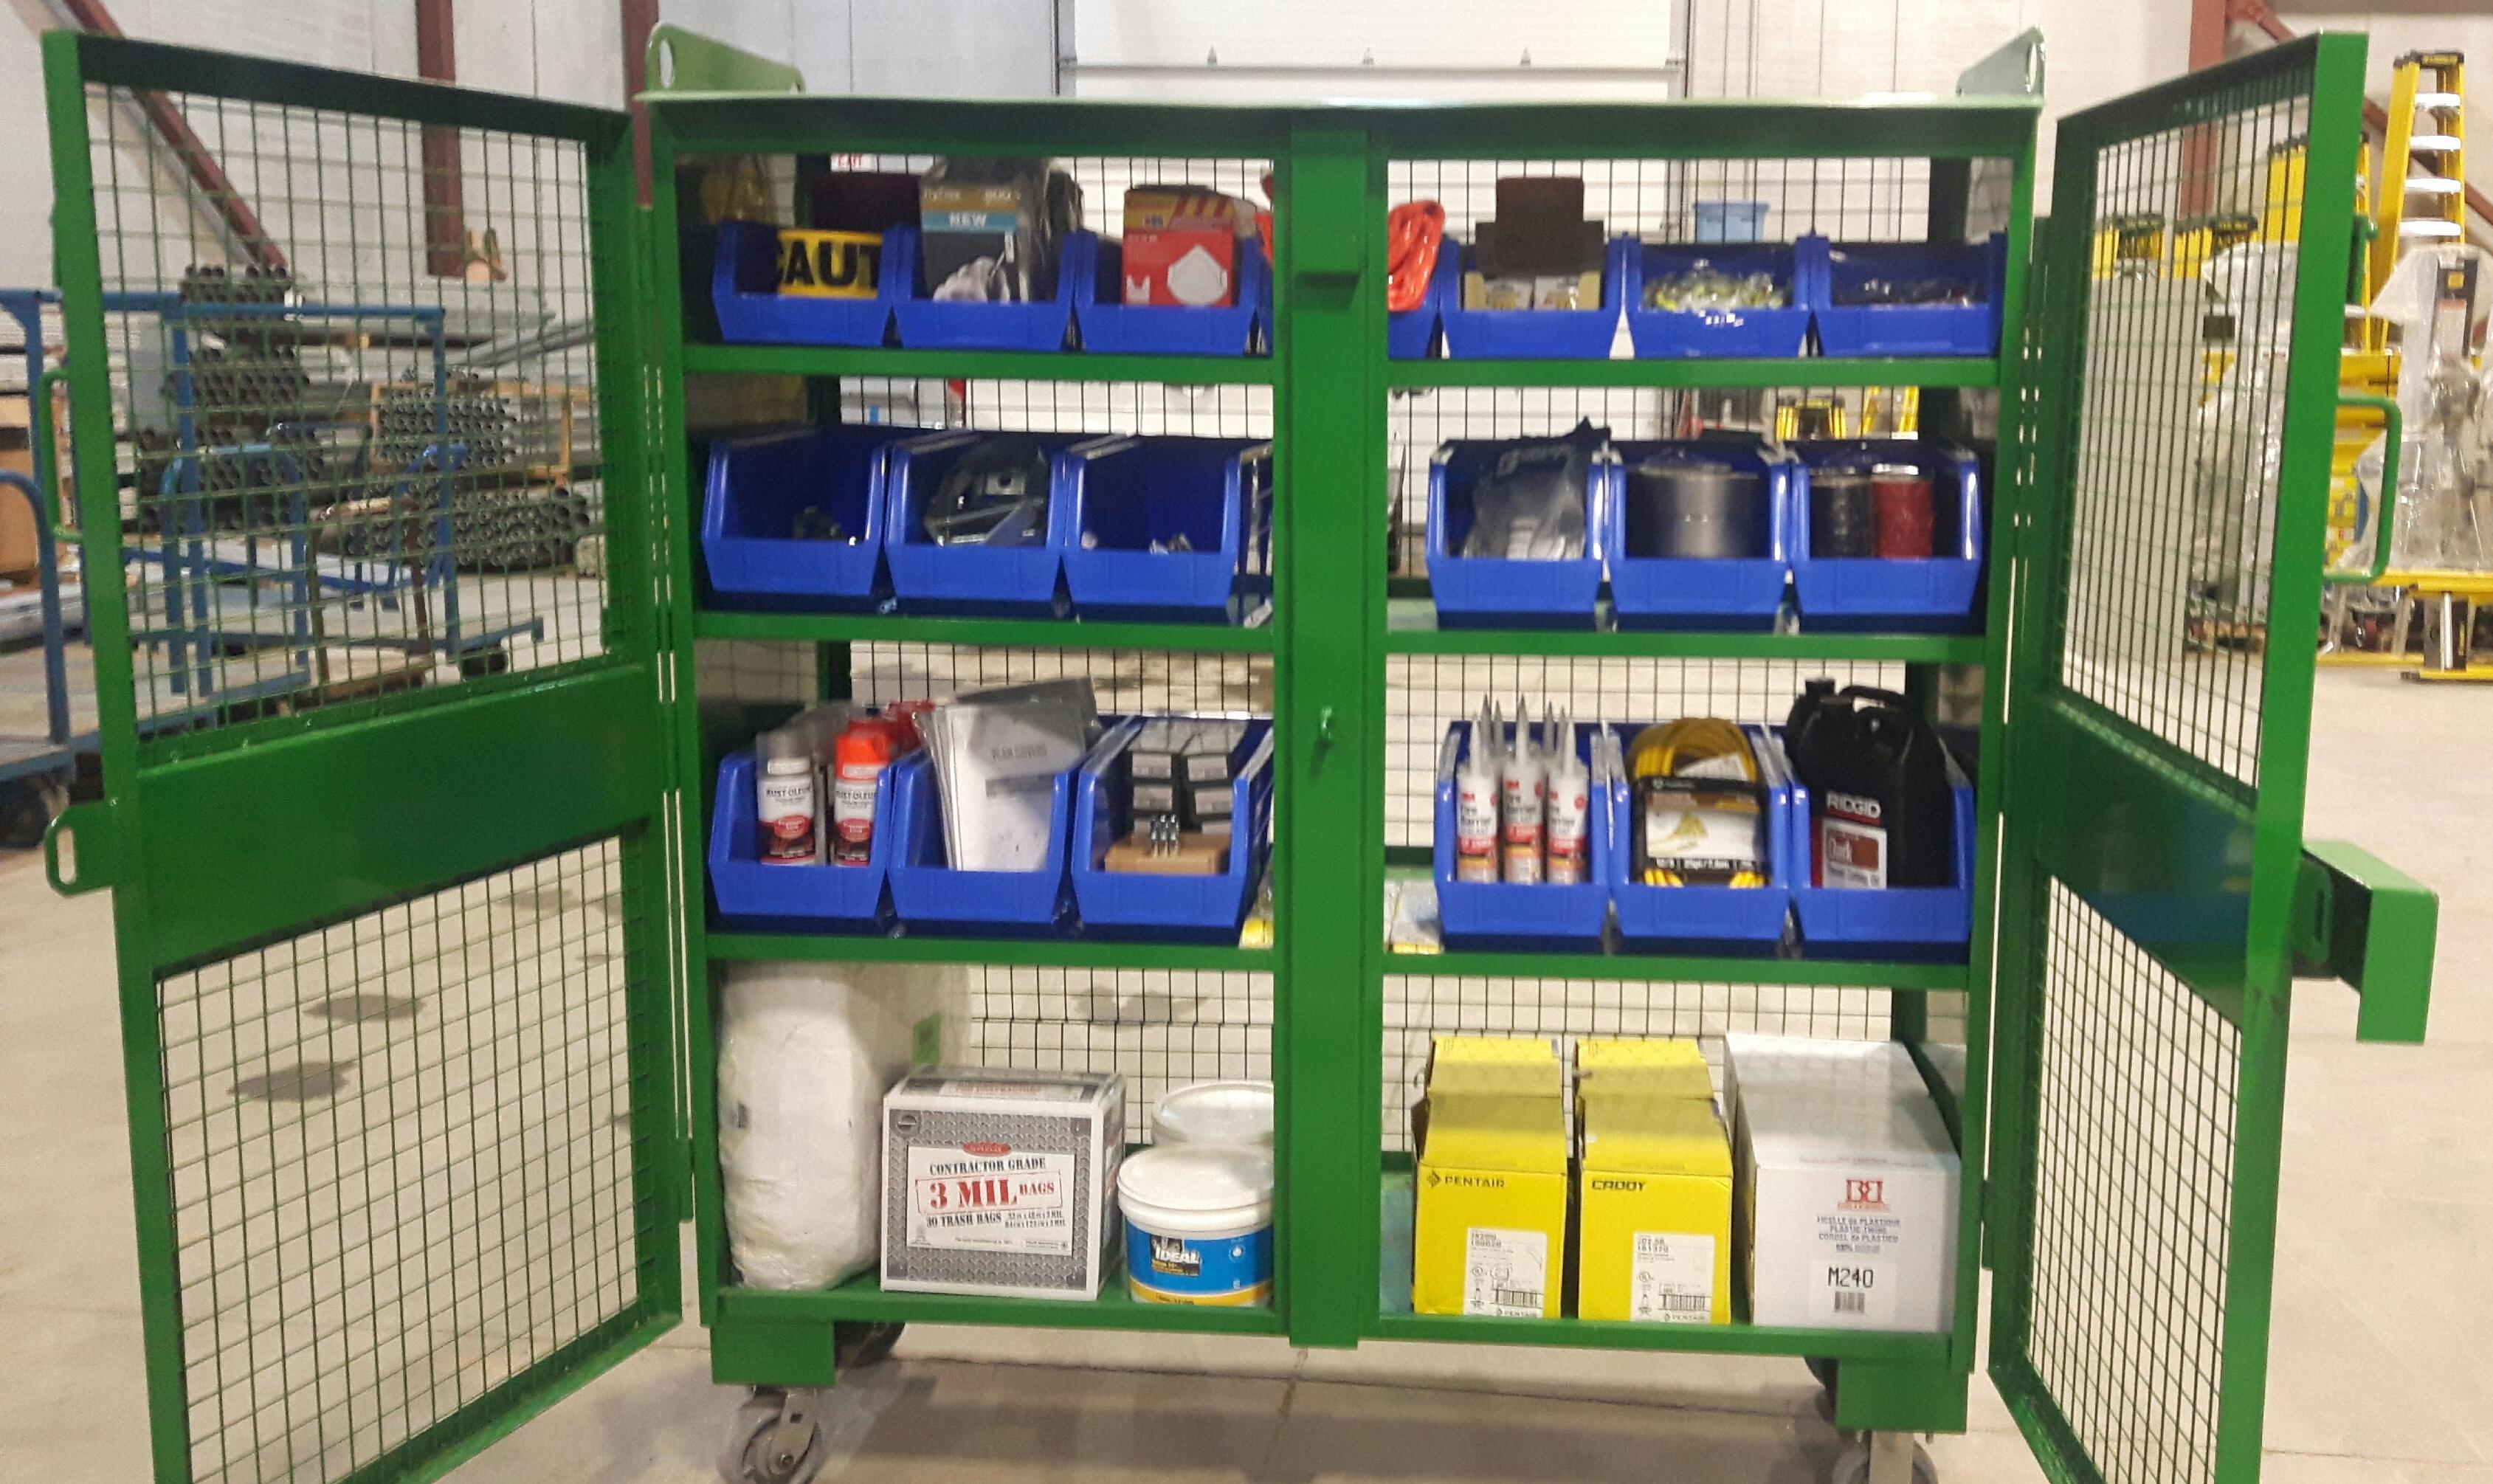 kelly kabinet inventory system